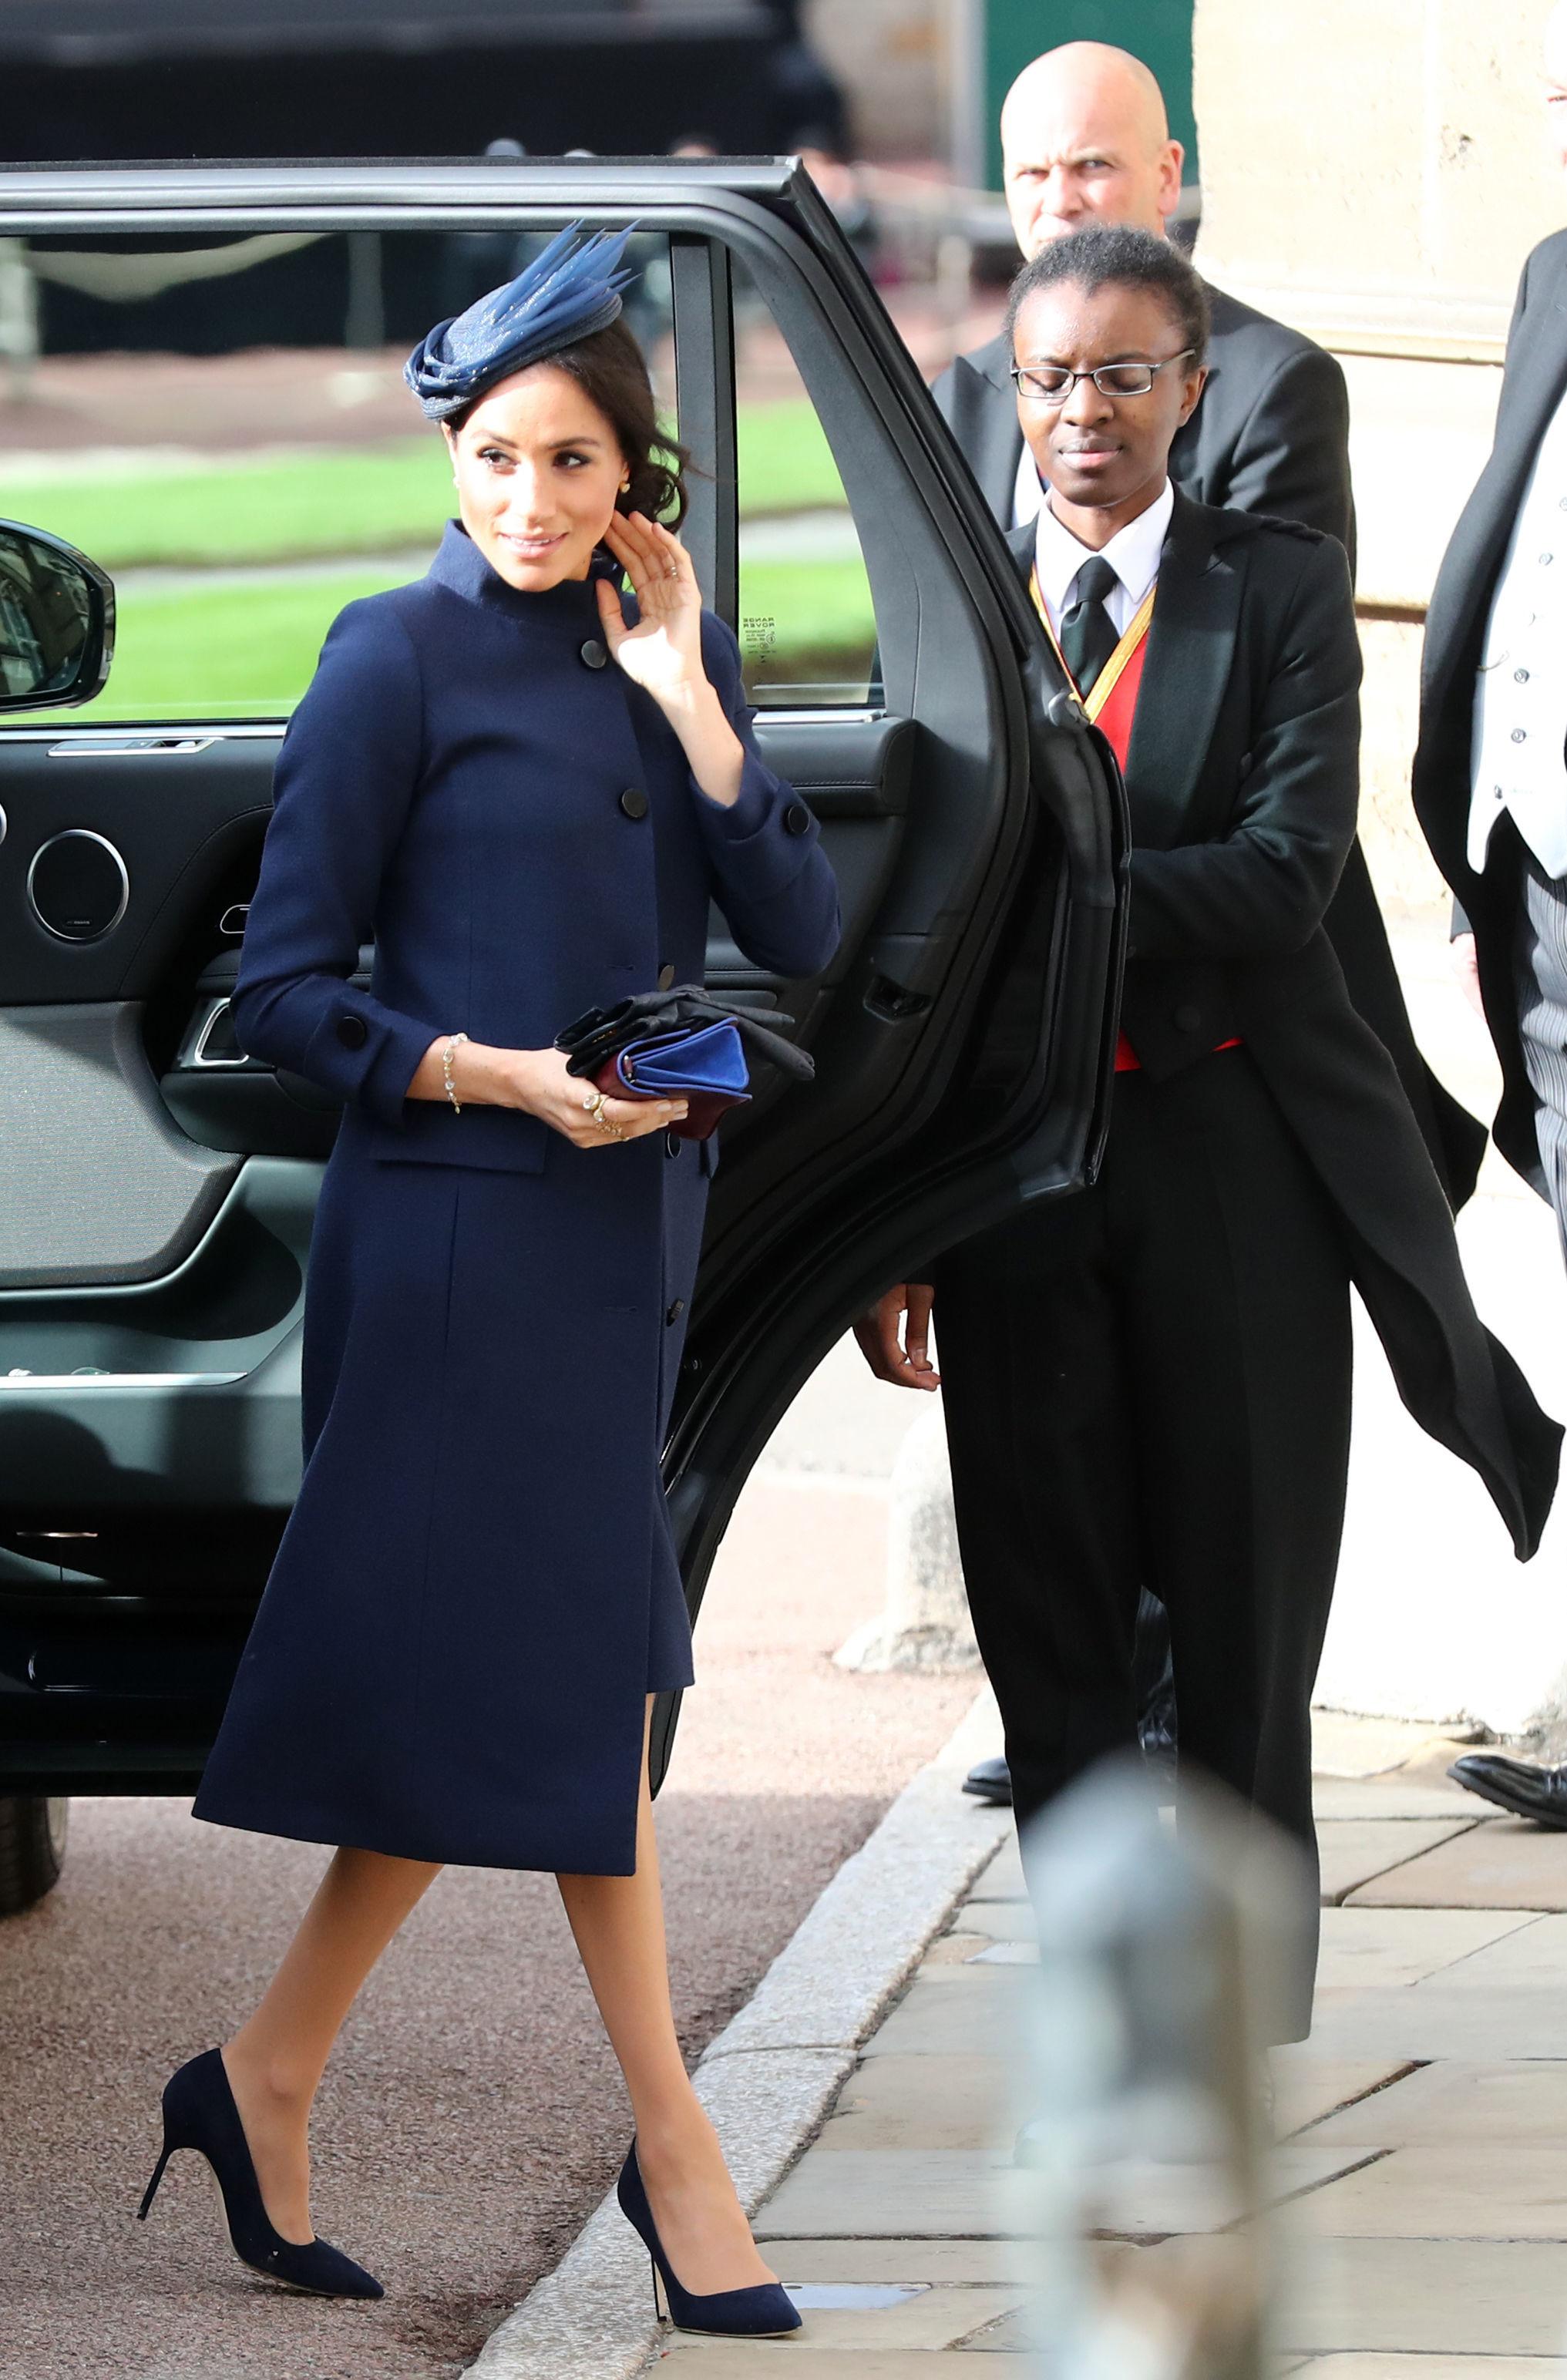 Meghan Markle at Princess Eugenie's 2018 royal wedding